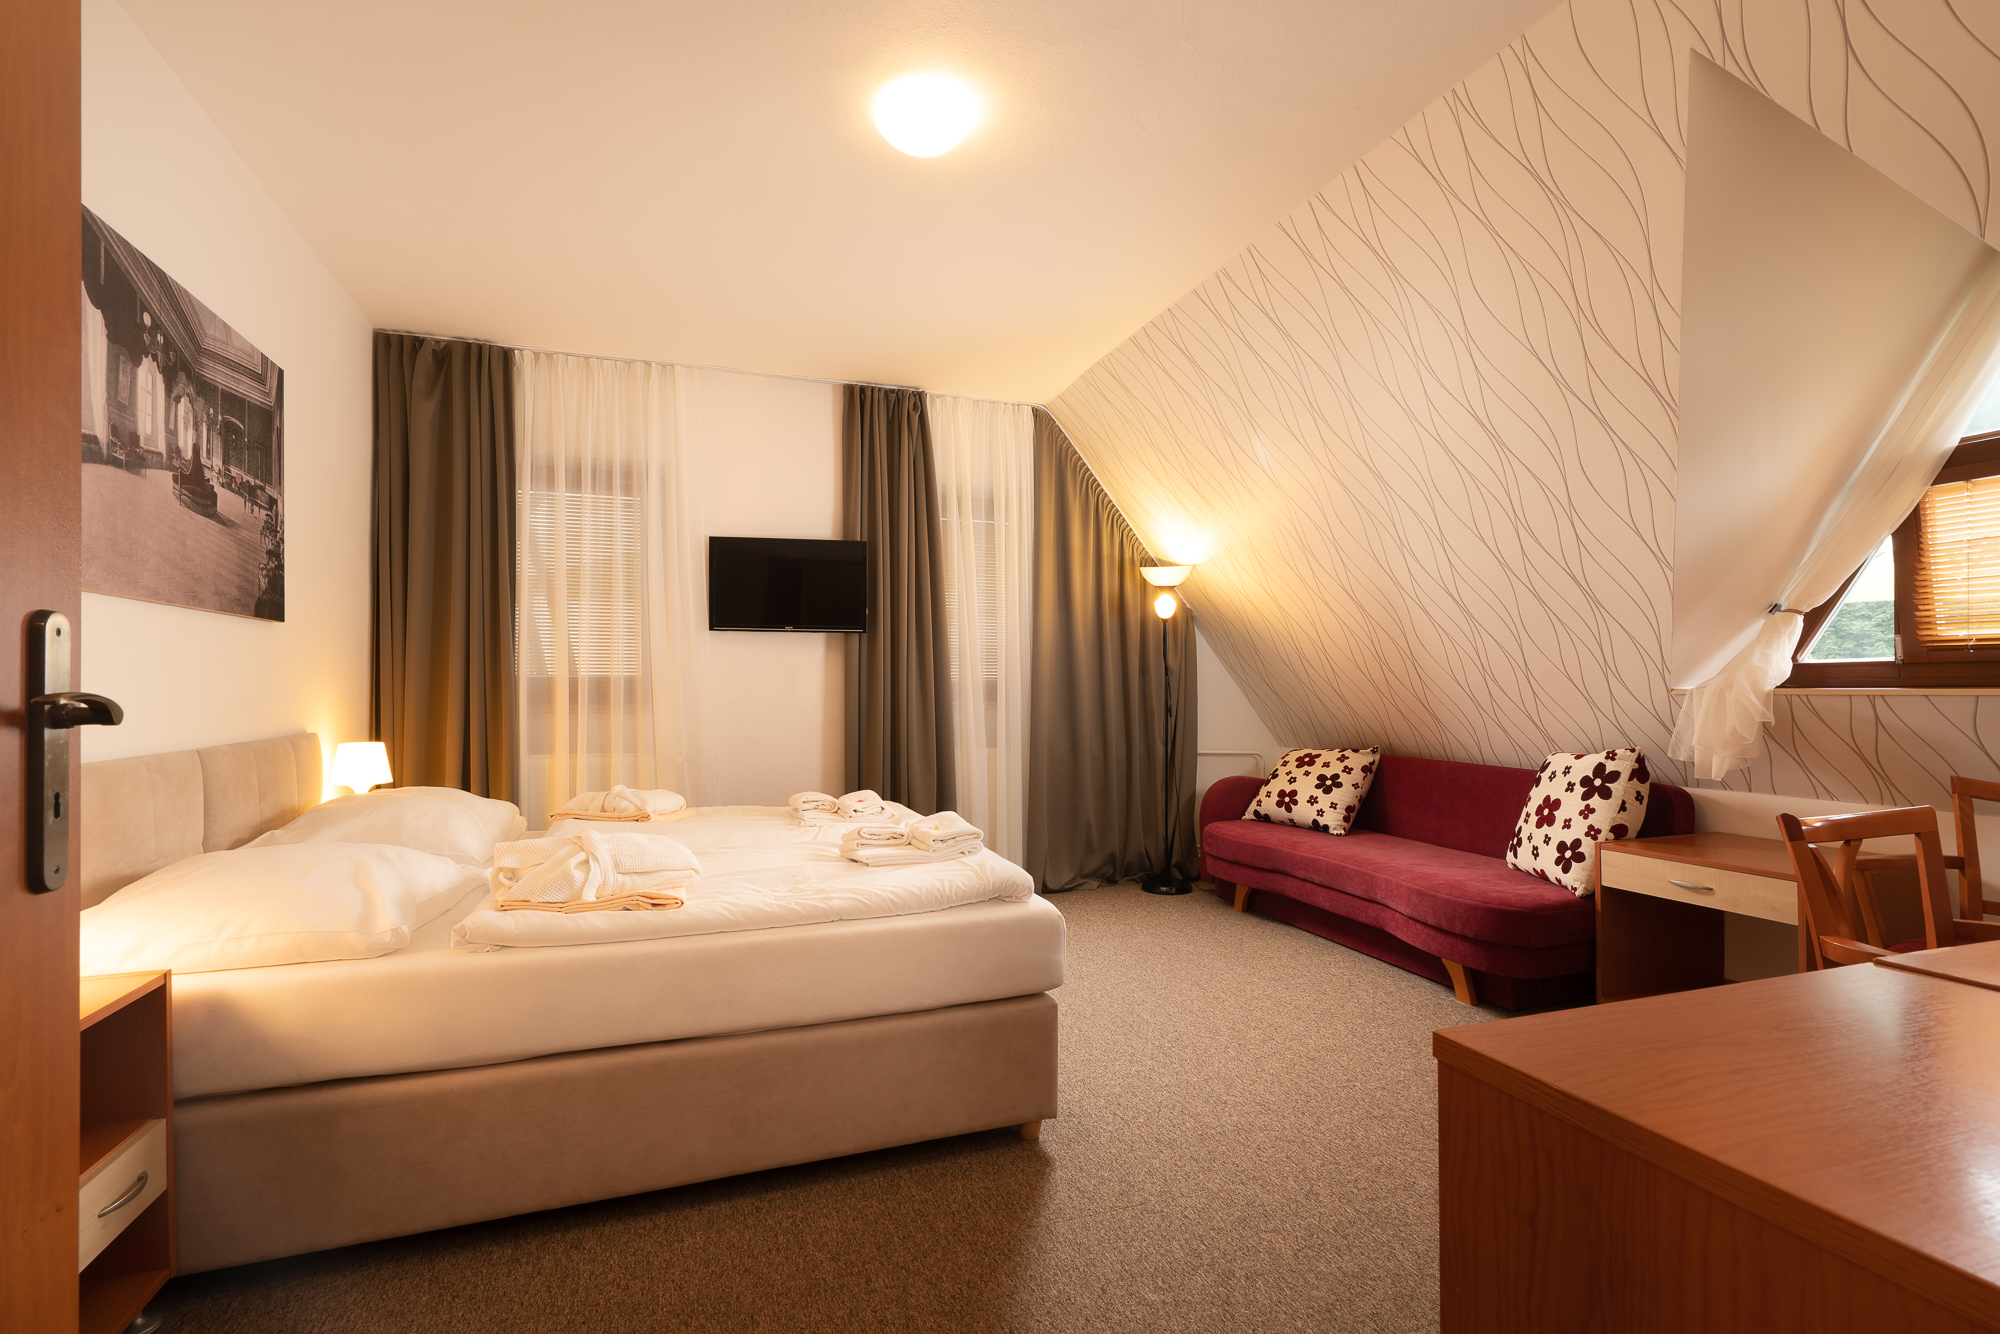 https://cms.satur.sk/data/imgs/tour_image/orig/hotel_termal_vyhne-40-1802508.jpg